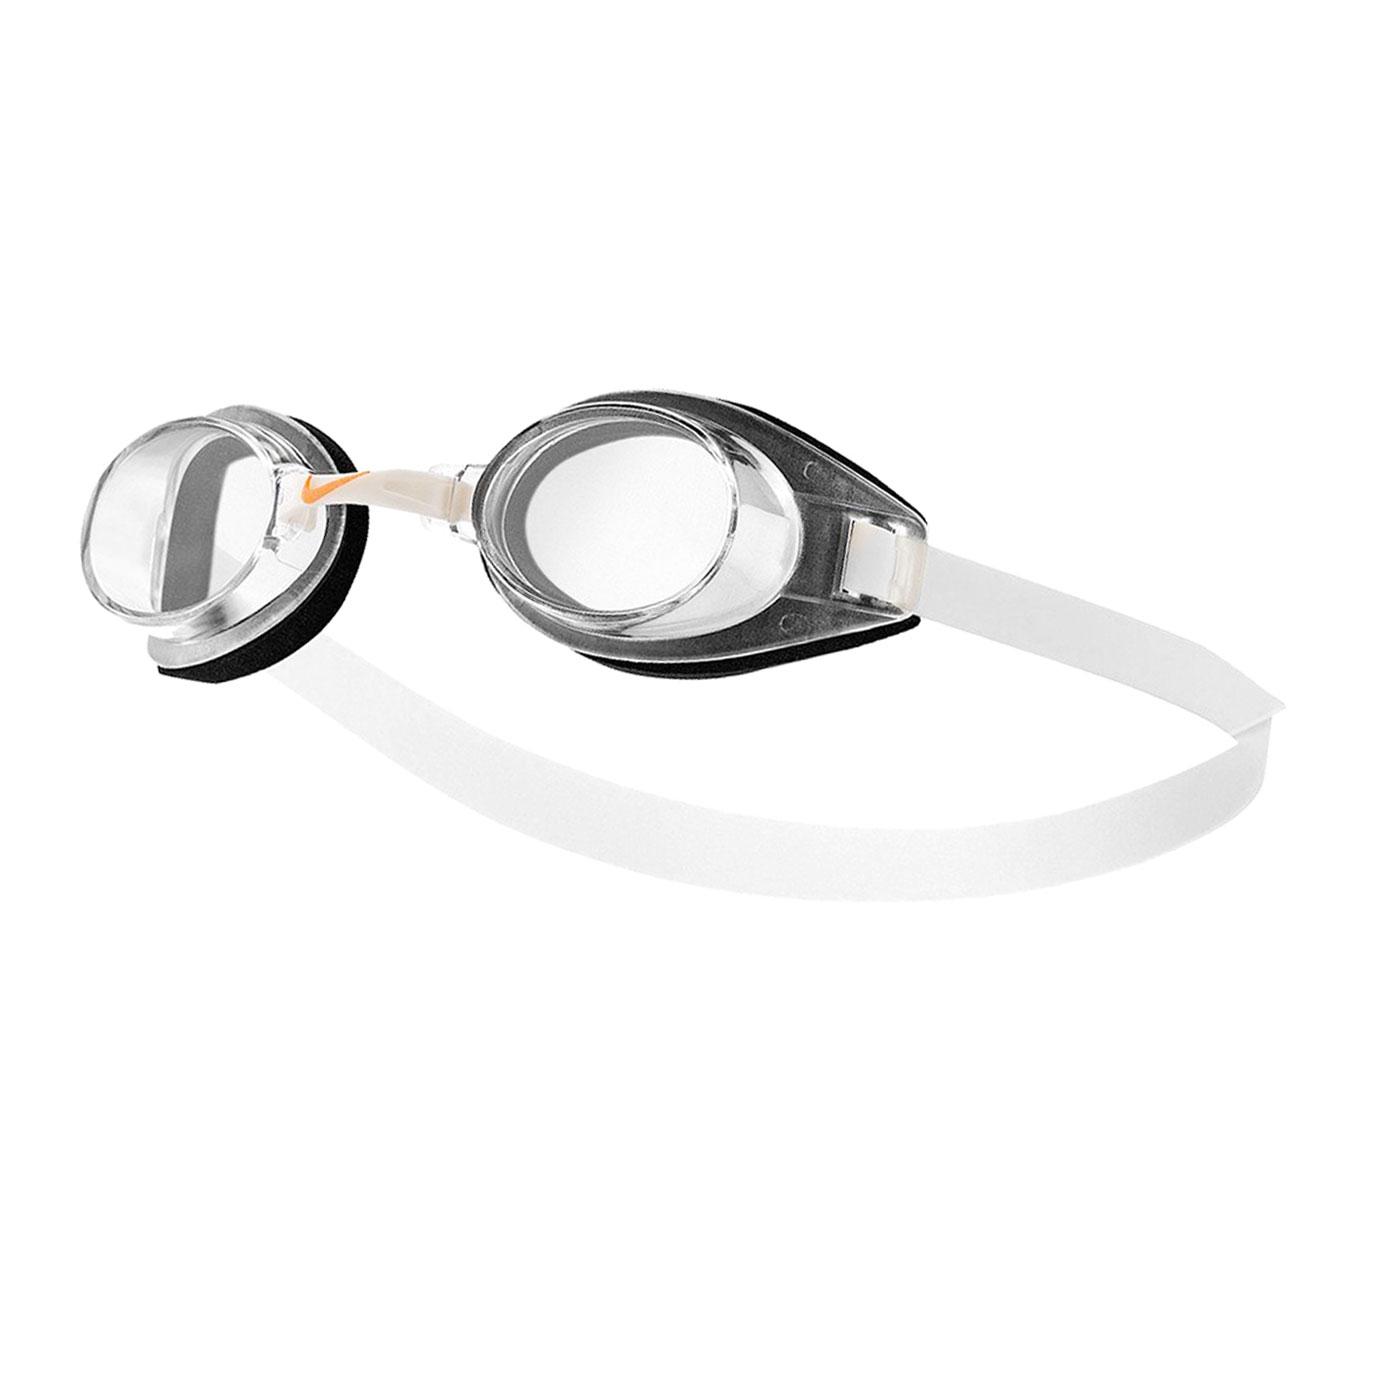 NIKE SWIM 休閒型成人泳鏡 TFSS0555-000 - 黑白橘